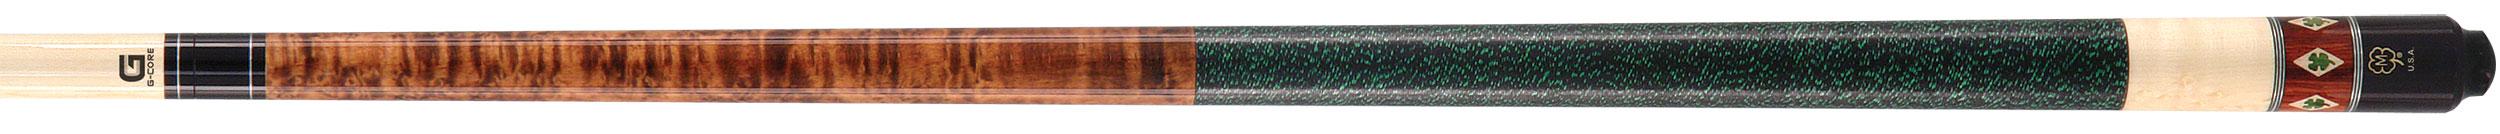 Mcdermott g303 piljardikii